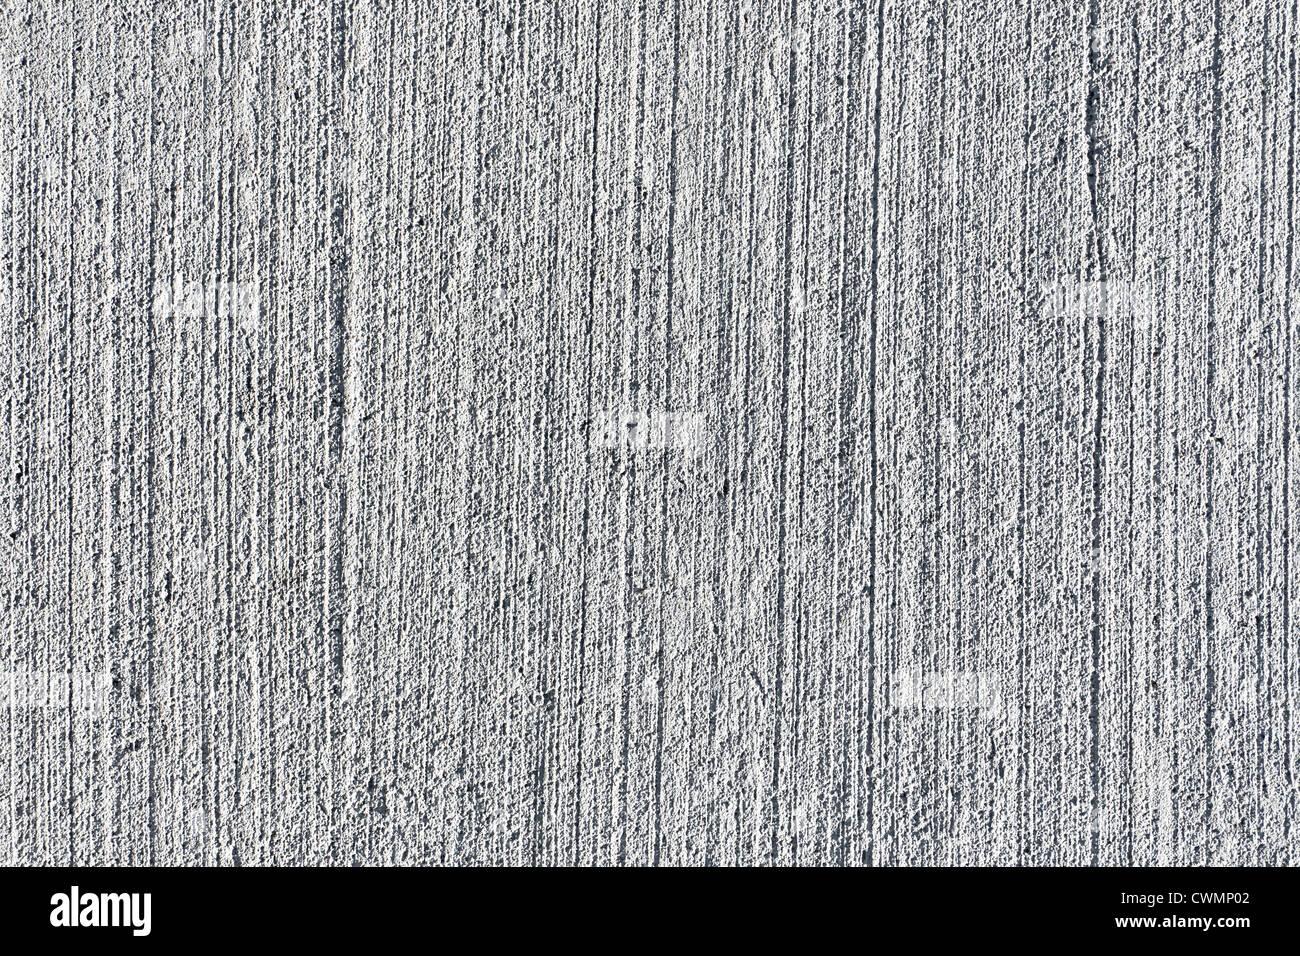 Fondo de hormigón con acabado con textura Imagen De Stock